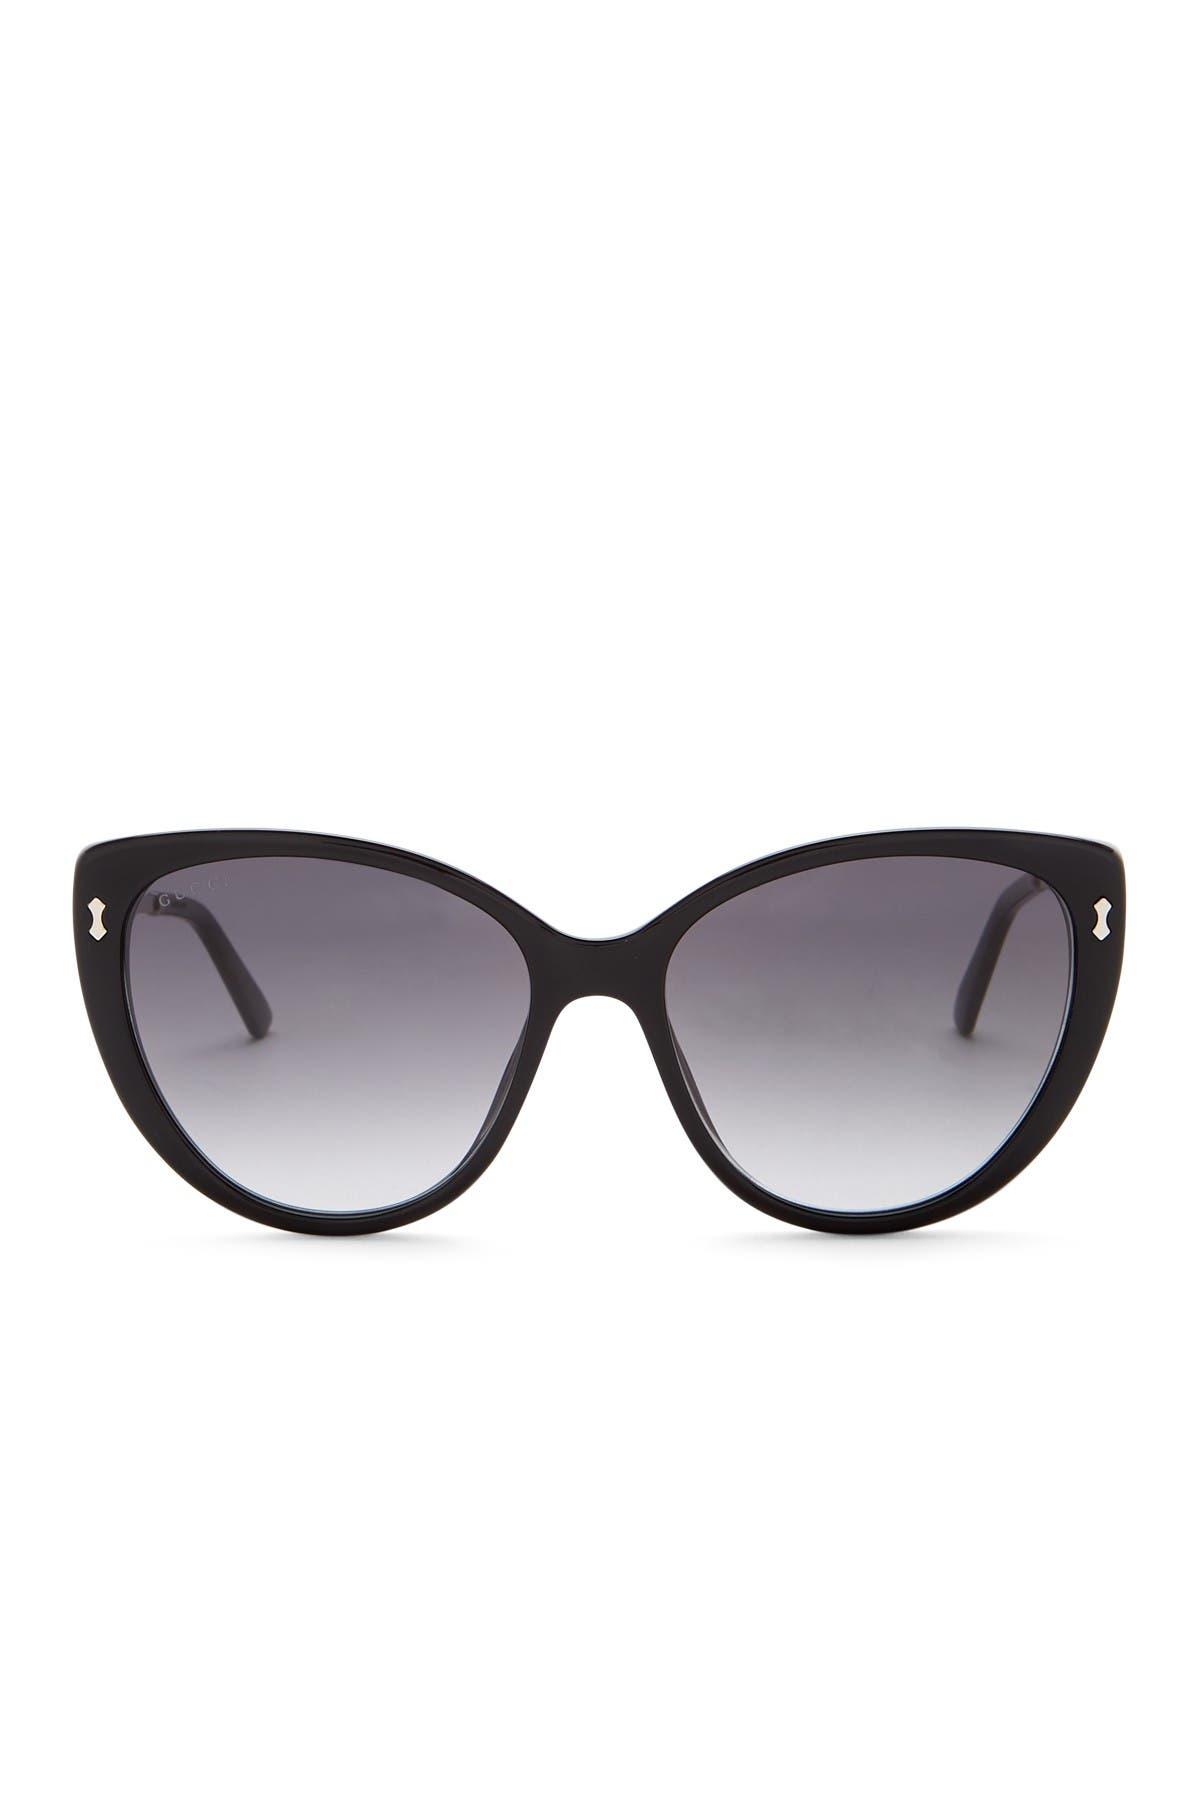 Image of GUCCI Women's 57mm Cat Eye Sunglasses